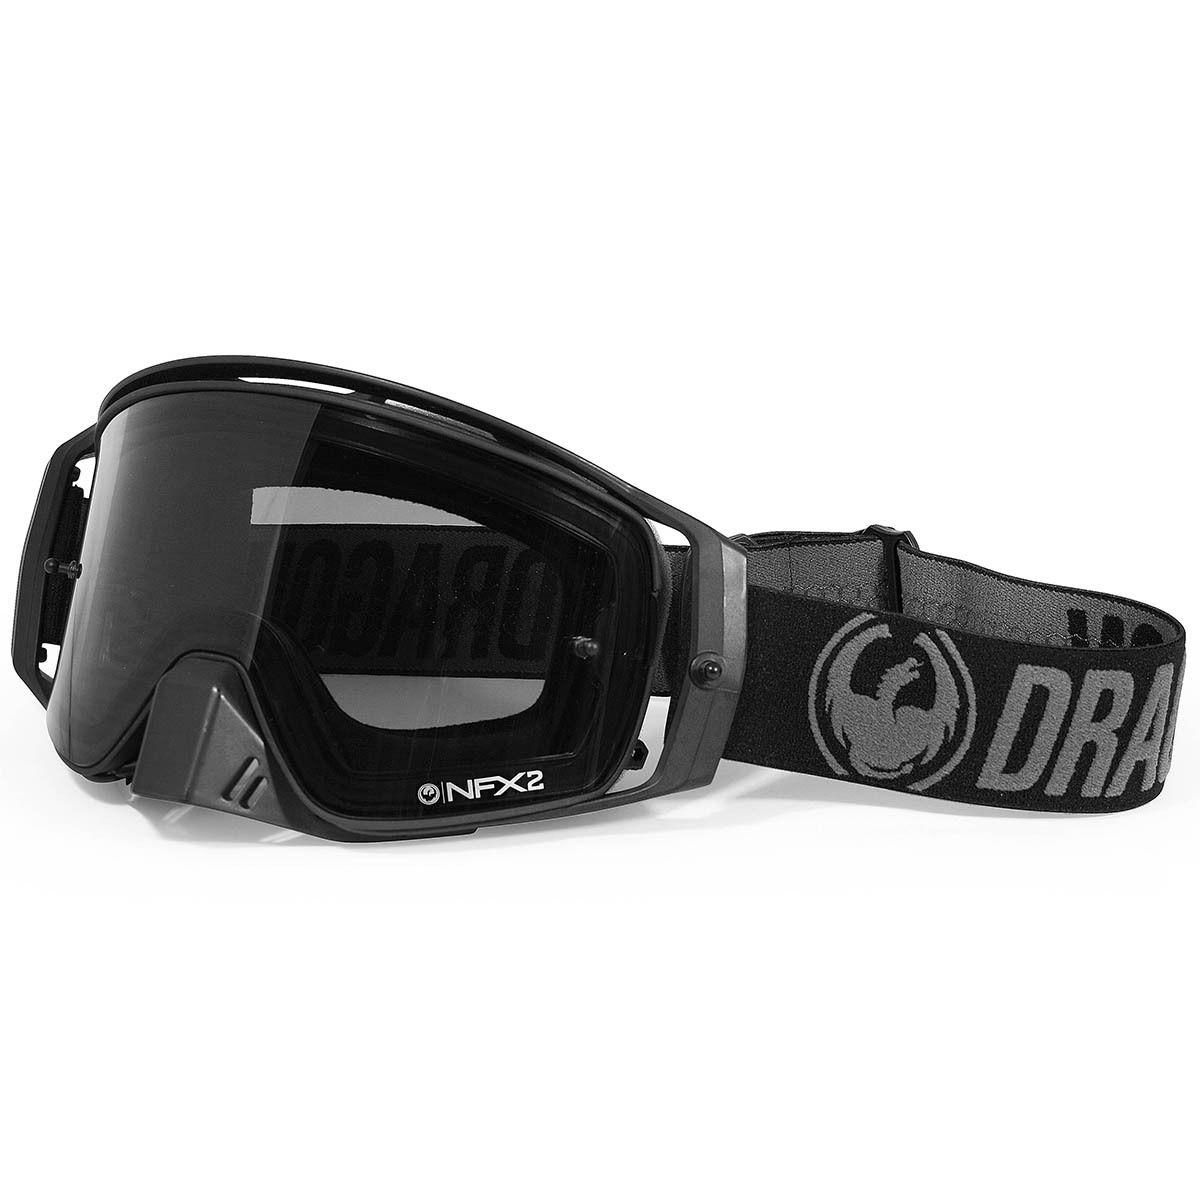 Dragon Nfx2 Black Injected Smoke Goggles At Mxstore Motocross Goggles Black Smoke Dirt Bike Gear